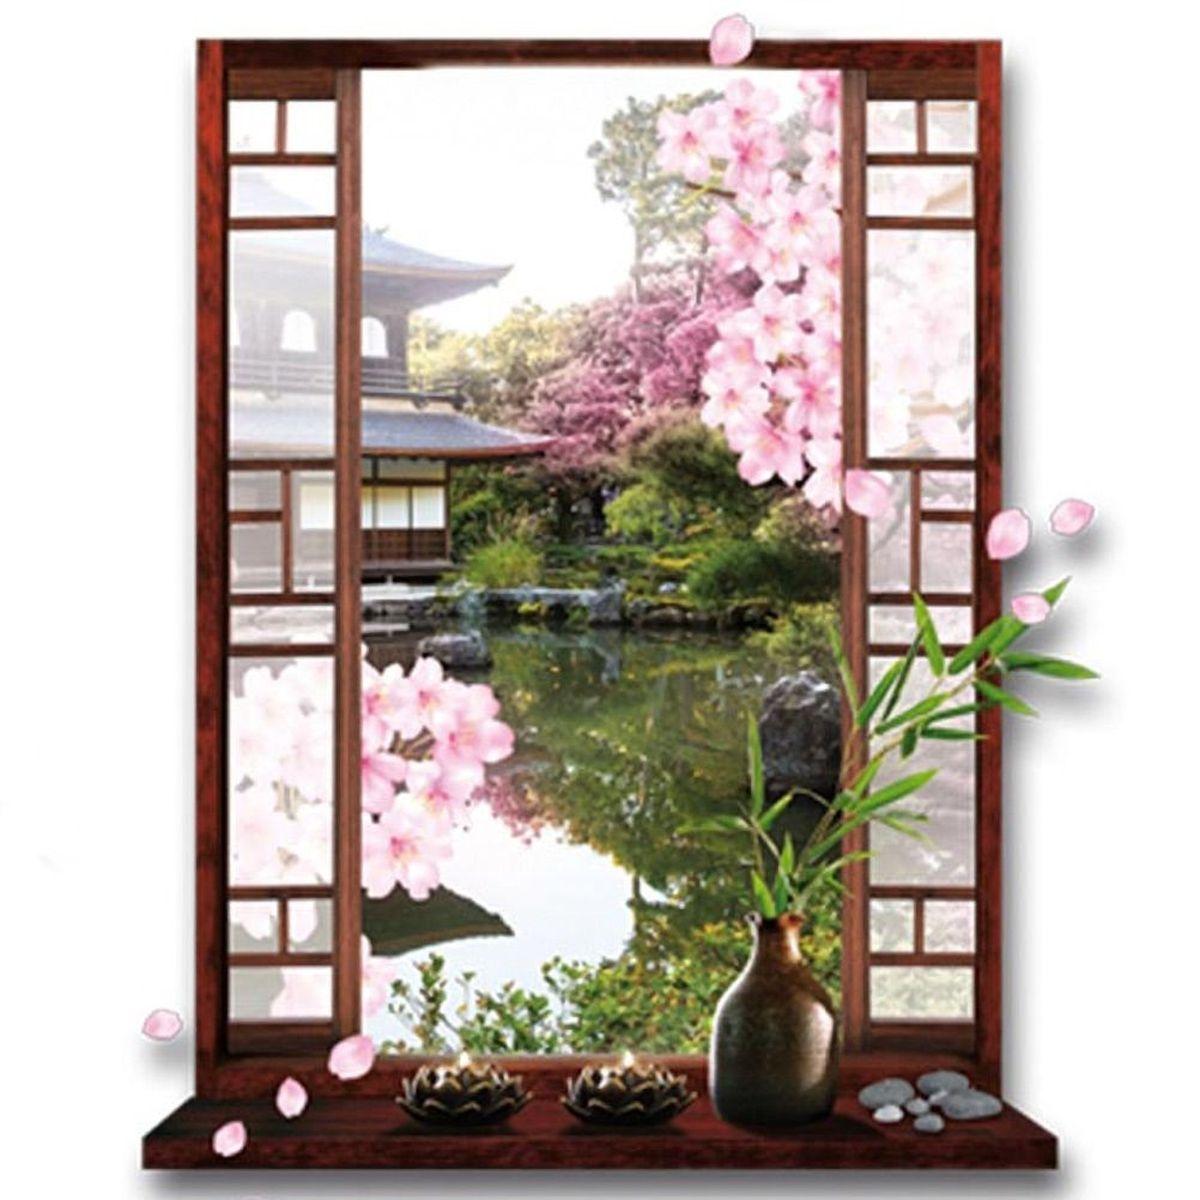 Sticker trompe l 39 oeil zen jardin japonais cerisier 50 x 70 cm - Trompe l oeil jardin ...